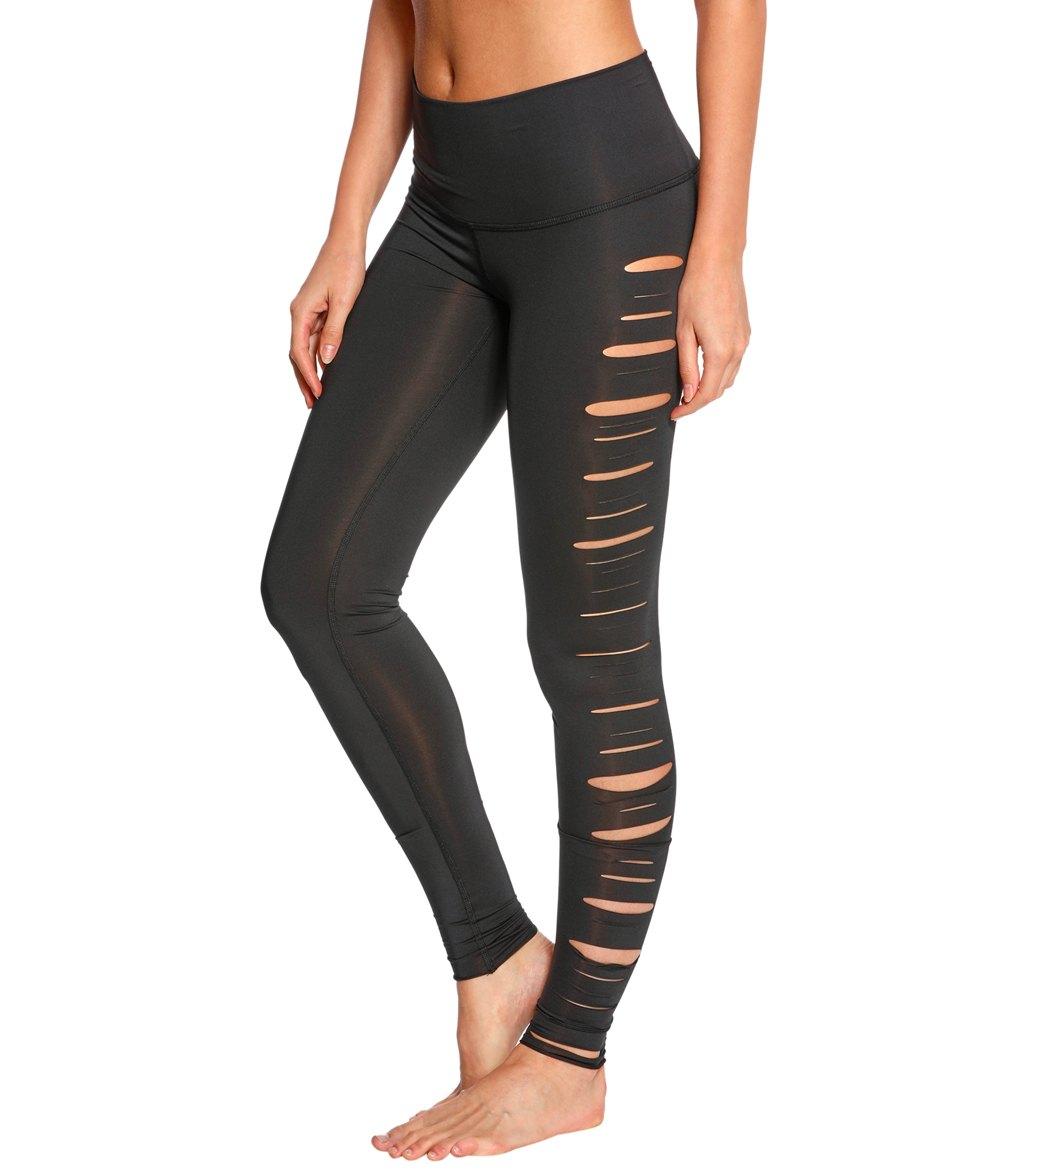 2415651f16a97 Teeki Laser Cut Shredded Jimi Hot Pants at YogaOutlet.com - Free ...